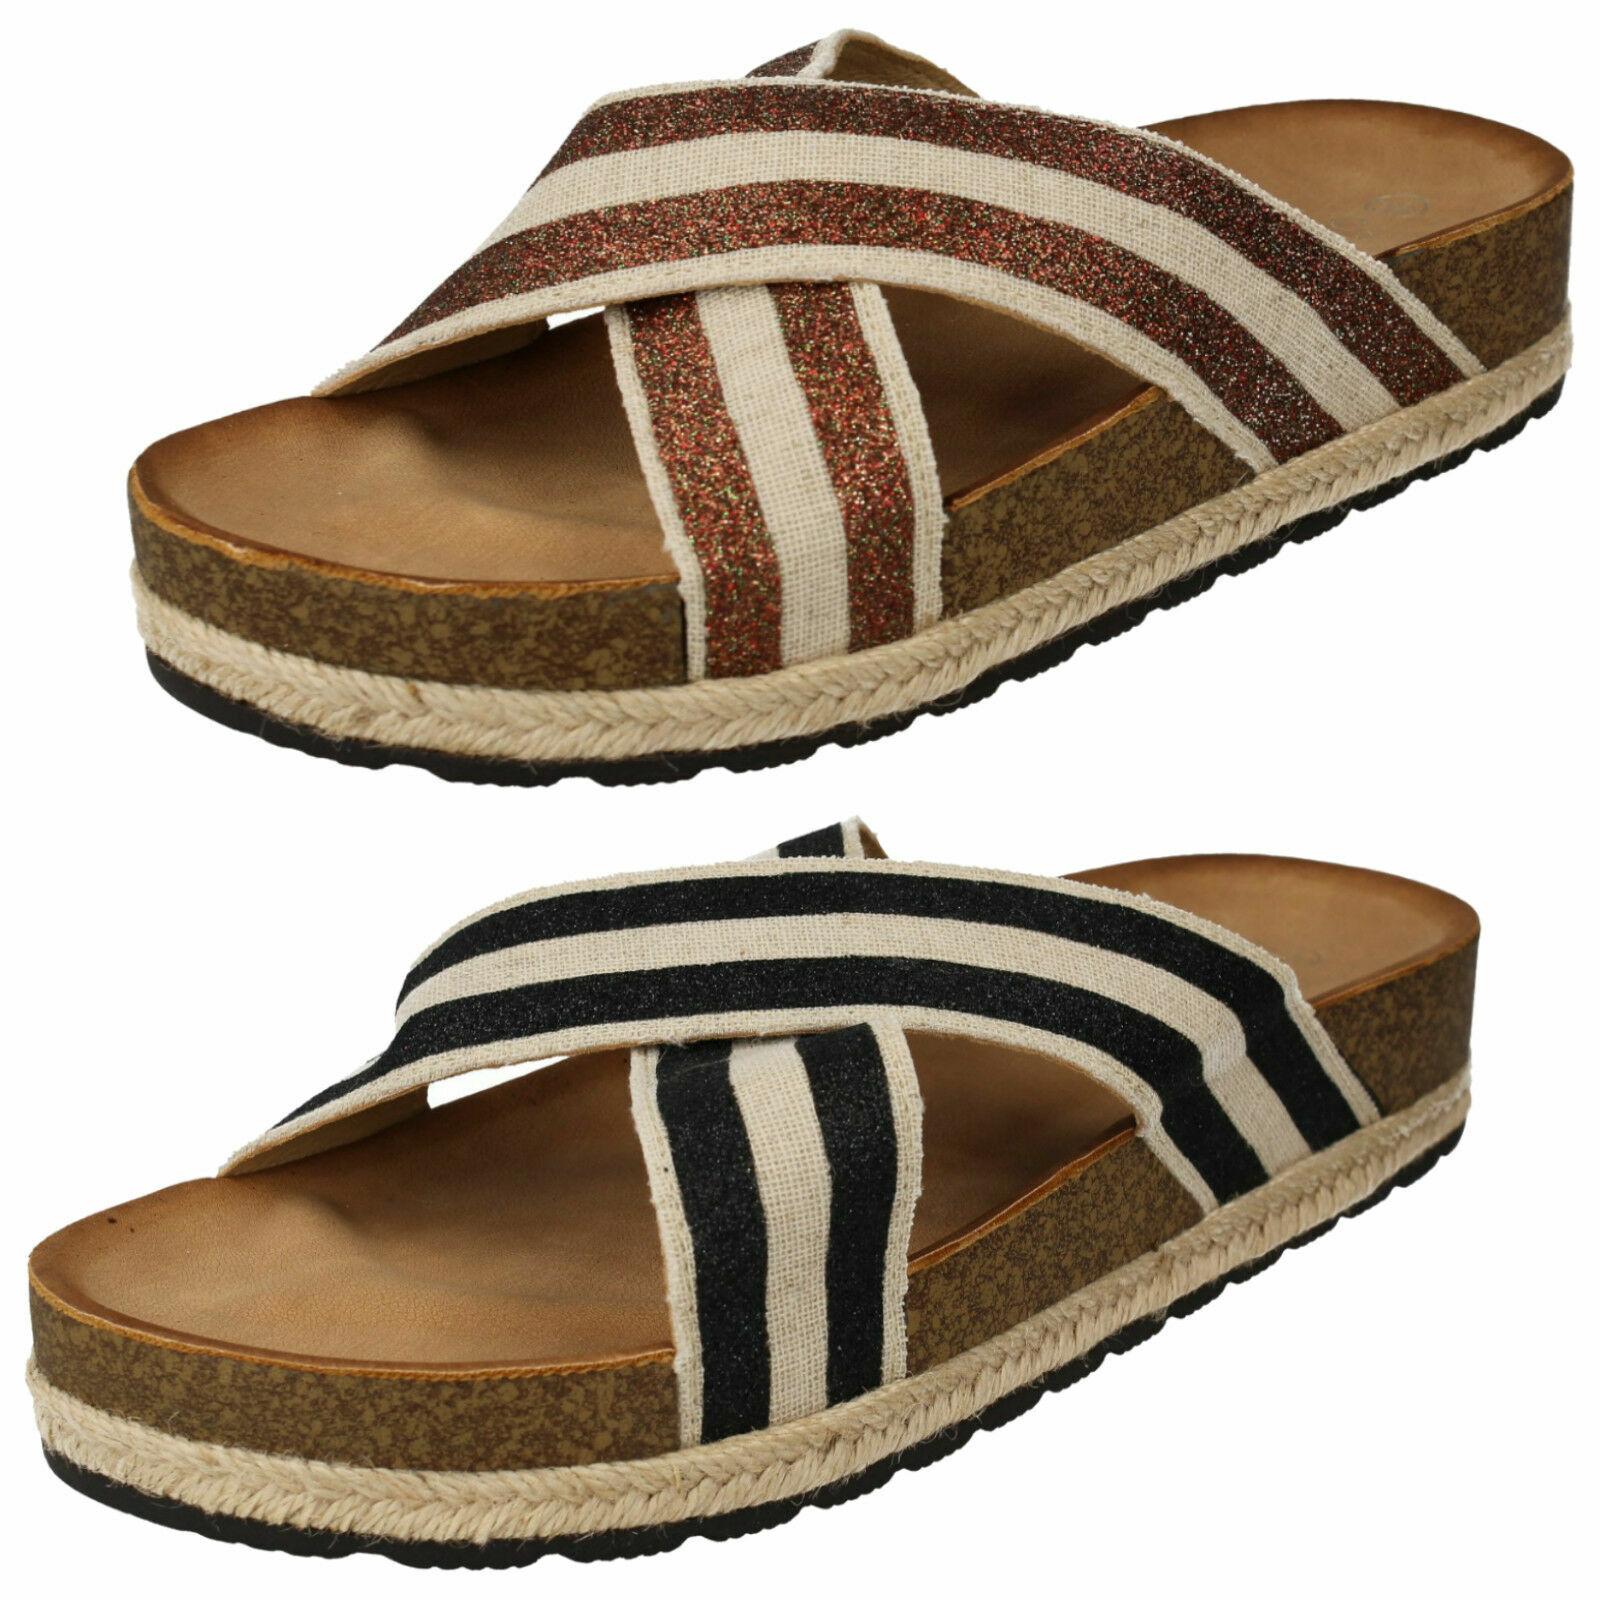 Ladies Savannah Slip On Mule Sandals F1R0866